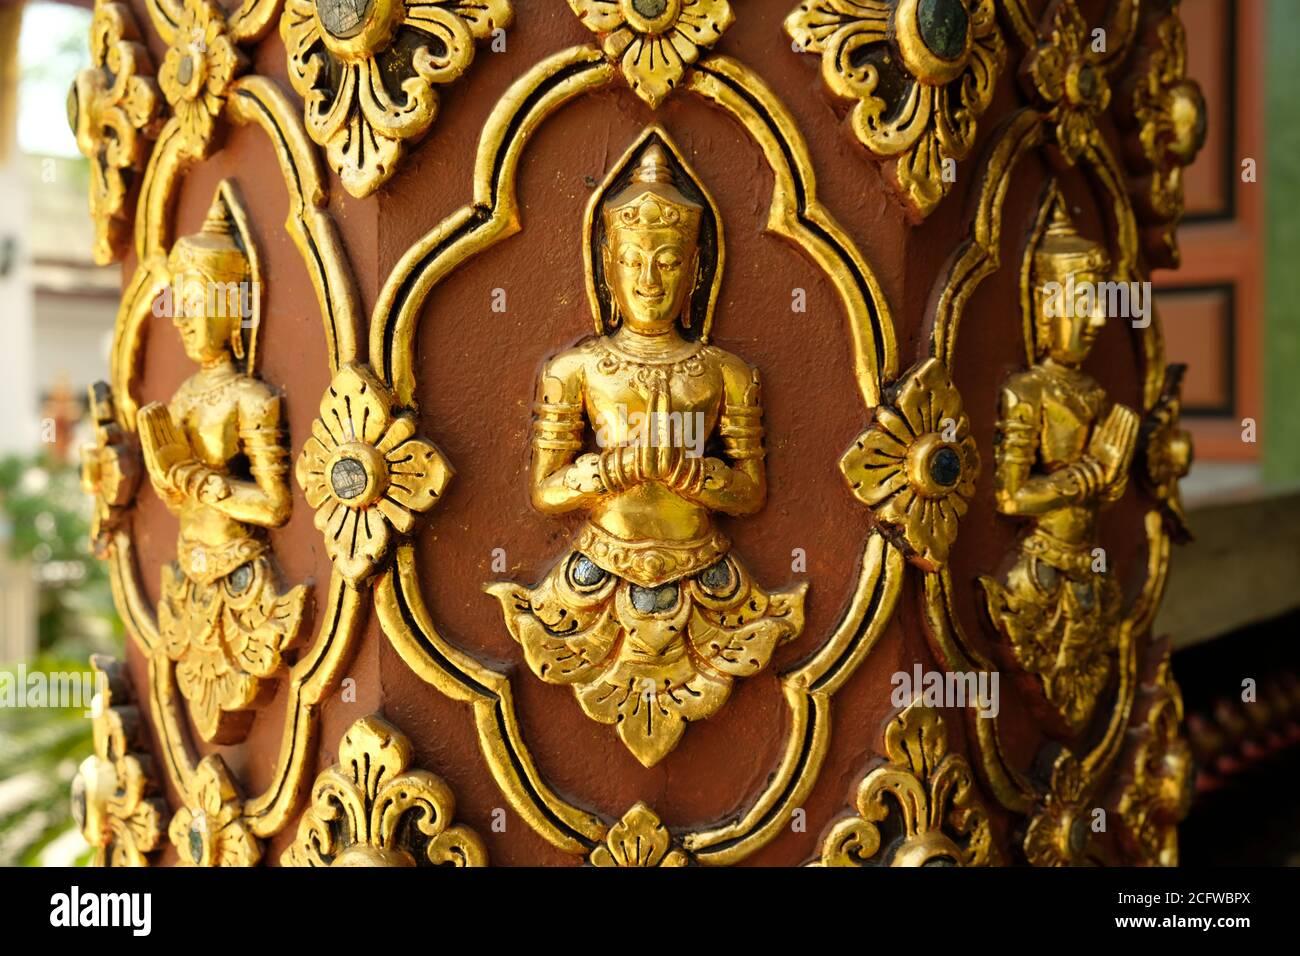 Chiang Mai Thailand - Pillar with golden Buddha in Temple Wat Buppharam Stock Photo